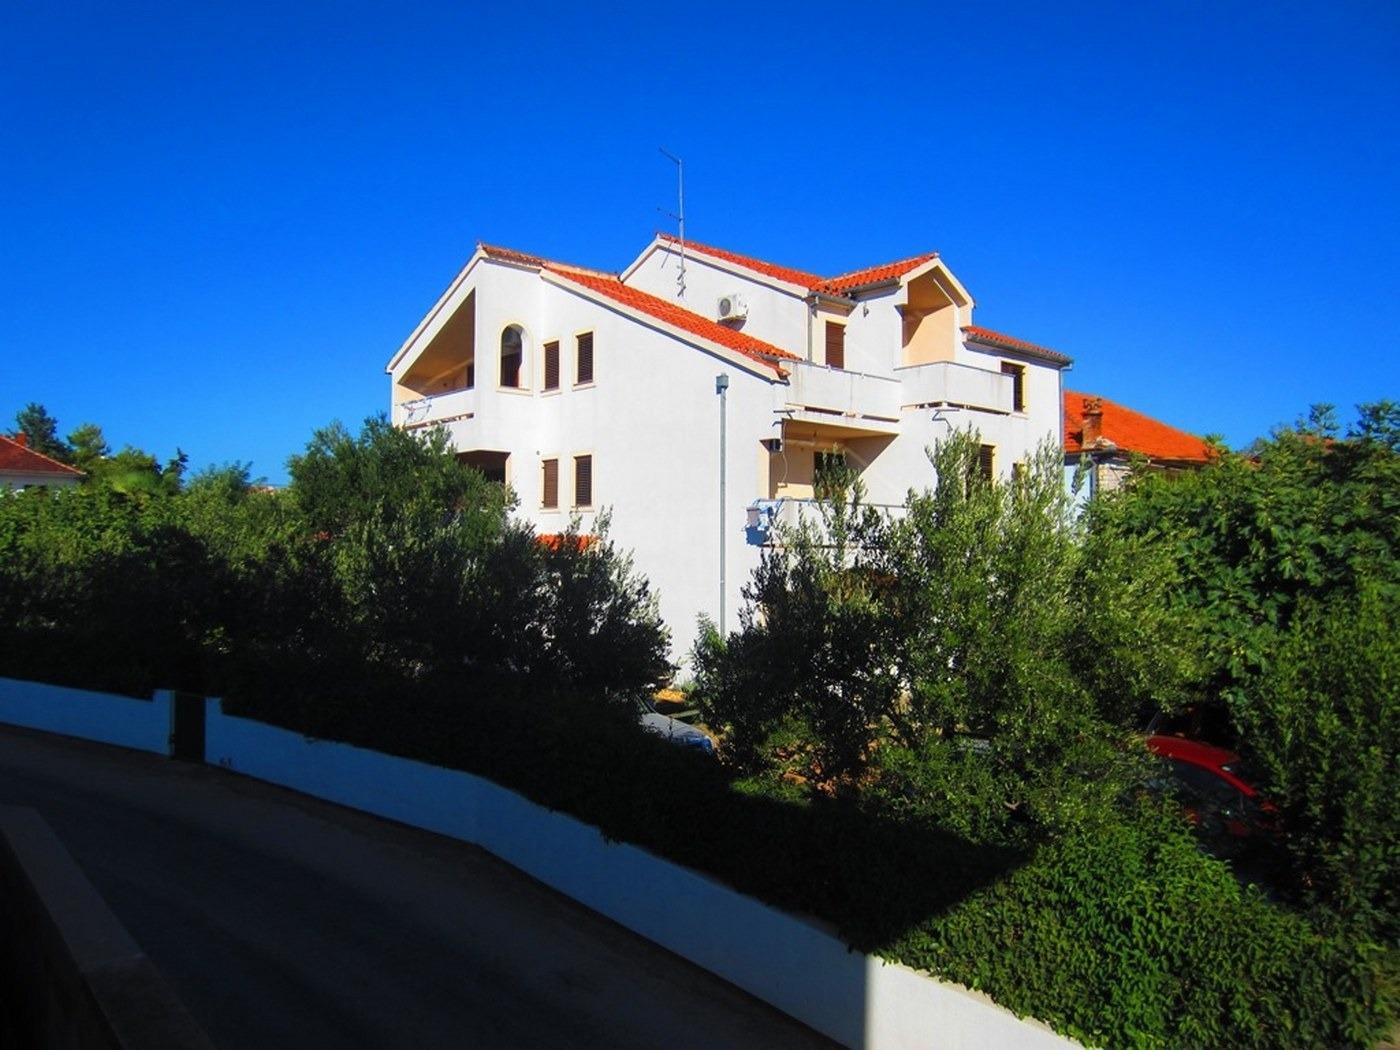 Ferienwohnung Ivan A2(4+1) - Turanj (918634), Turanj, , Dalmatien, Kroatien, Bild 1